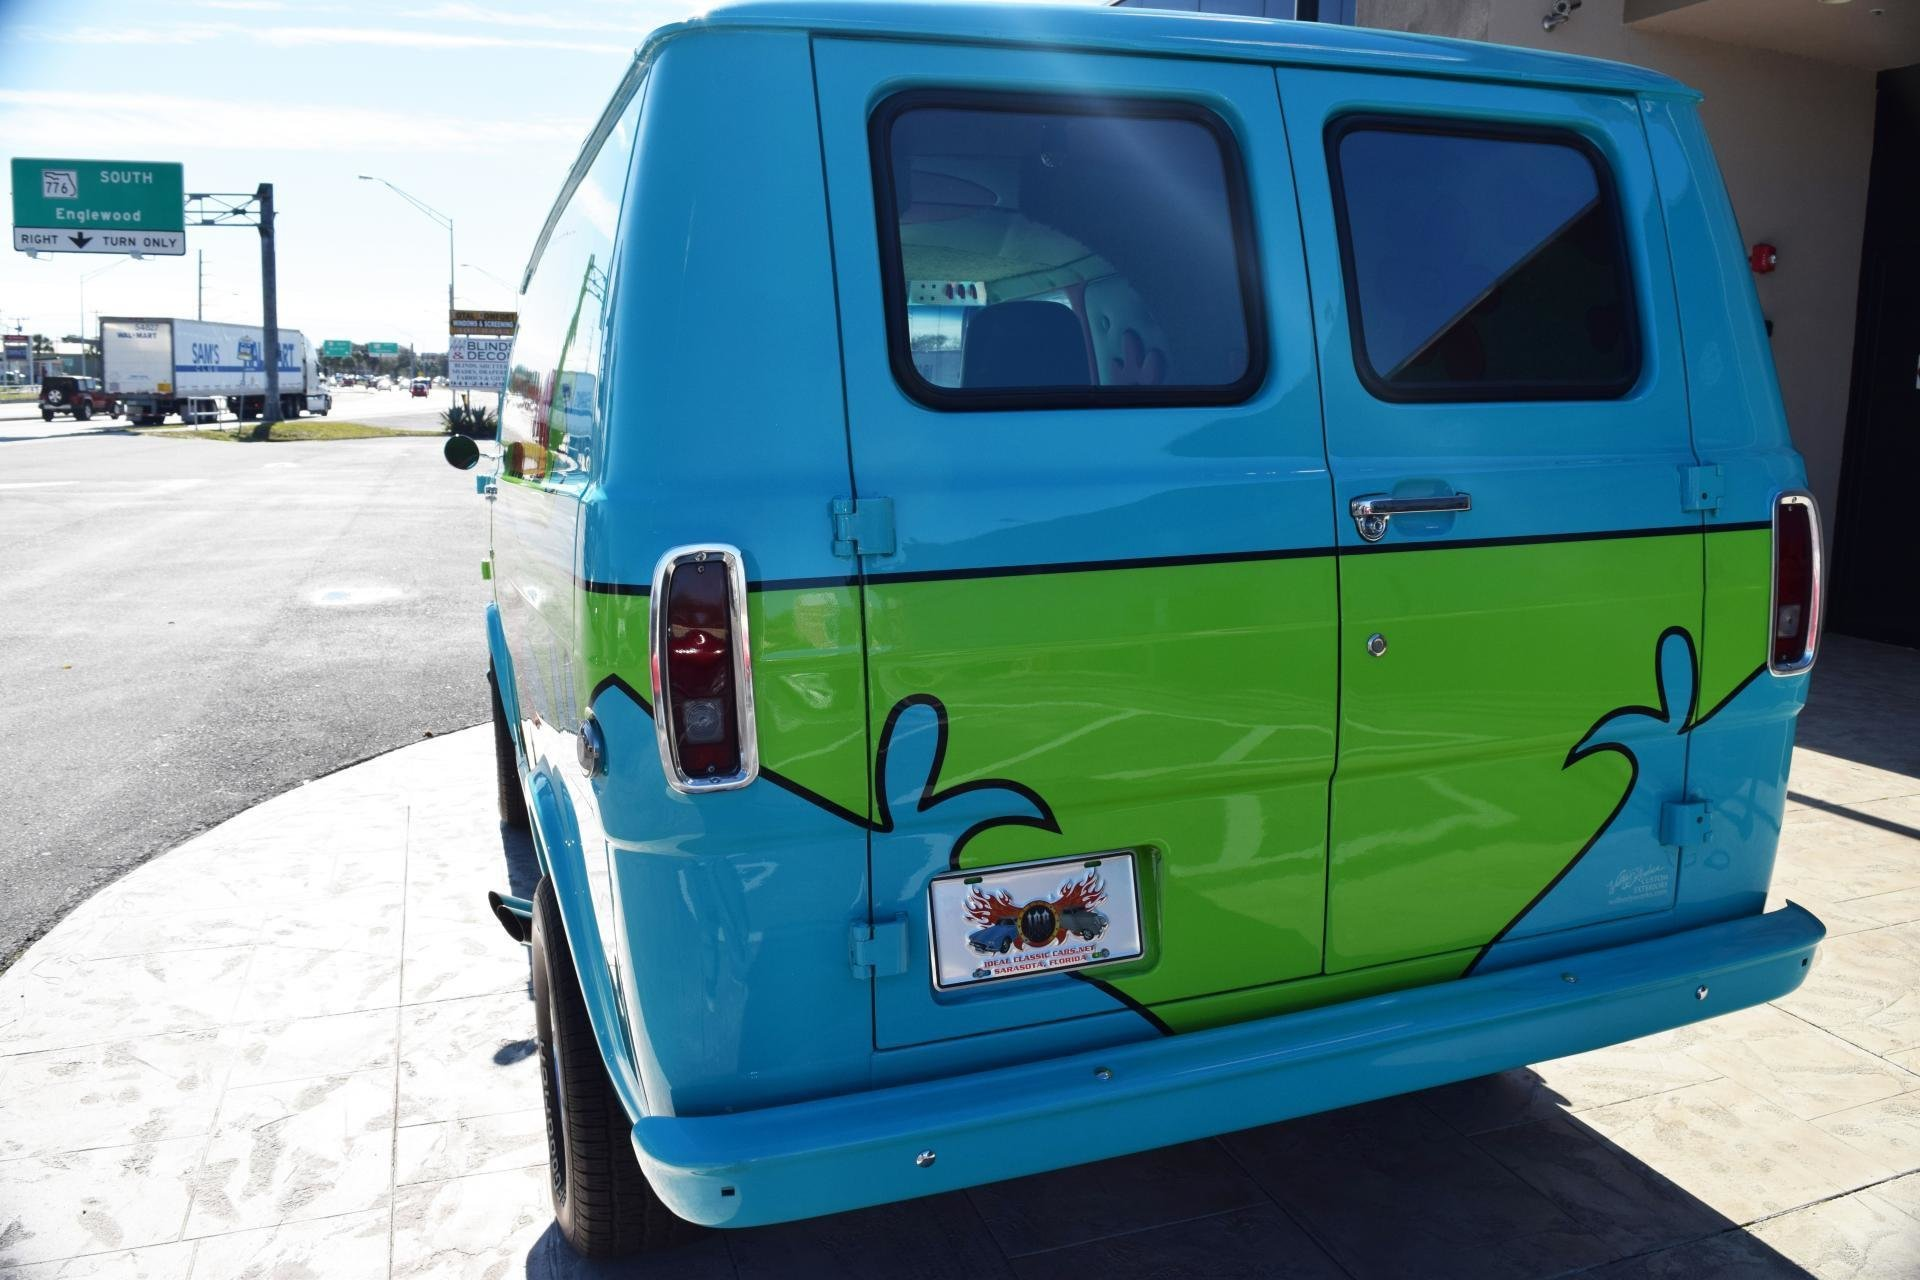 Poland Machinery Dealers Doo Mail: 1972 Z Movie Car Scooby Doo Mystery Machine For Sale